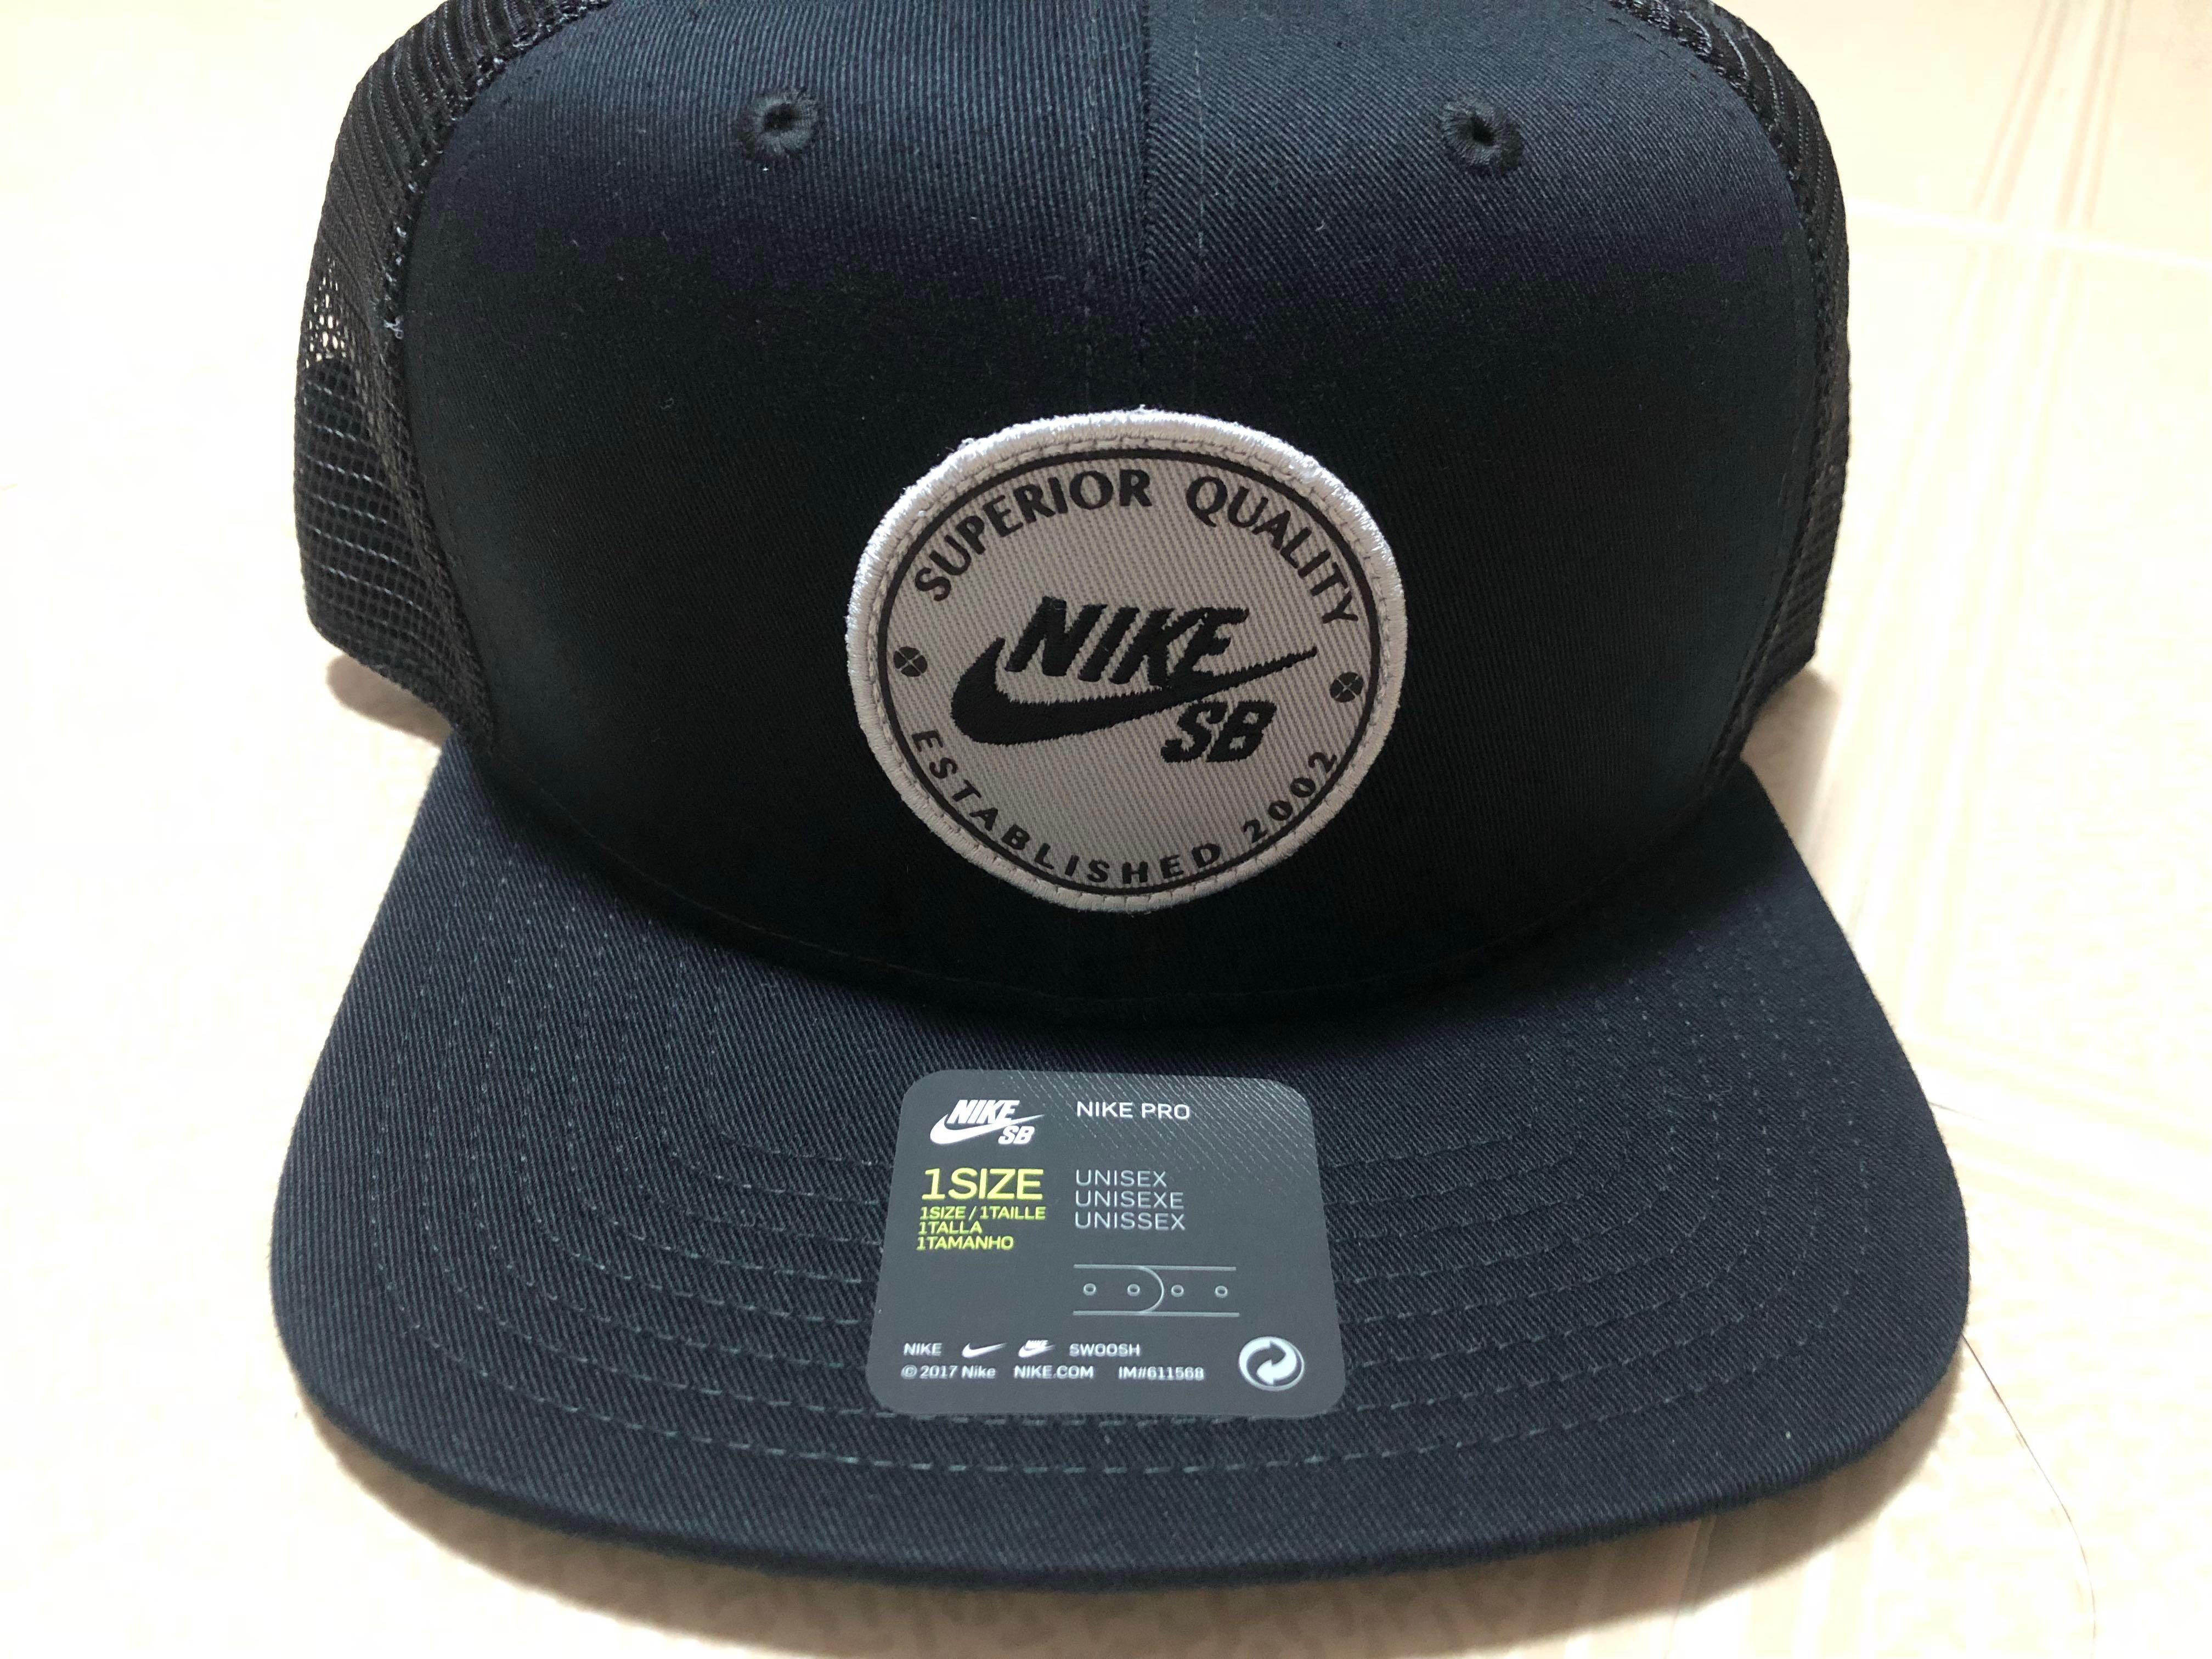 482e40f6 Nike SB Cap/Hat Unisex, Women's Fashion, Accessories, Caps & Hats on  Carousell